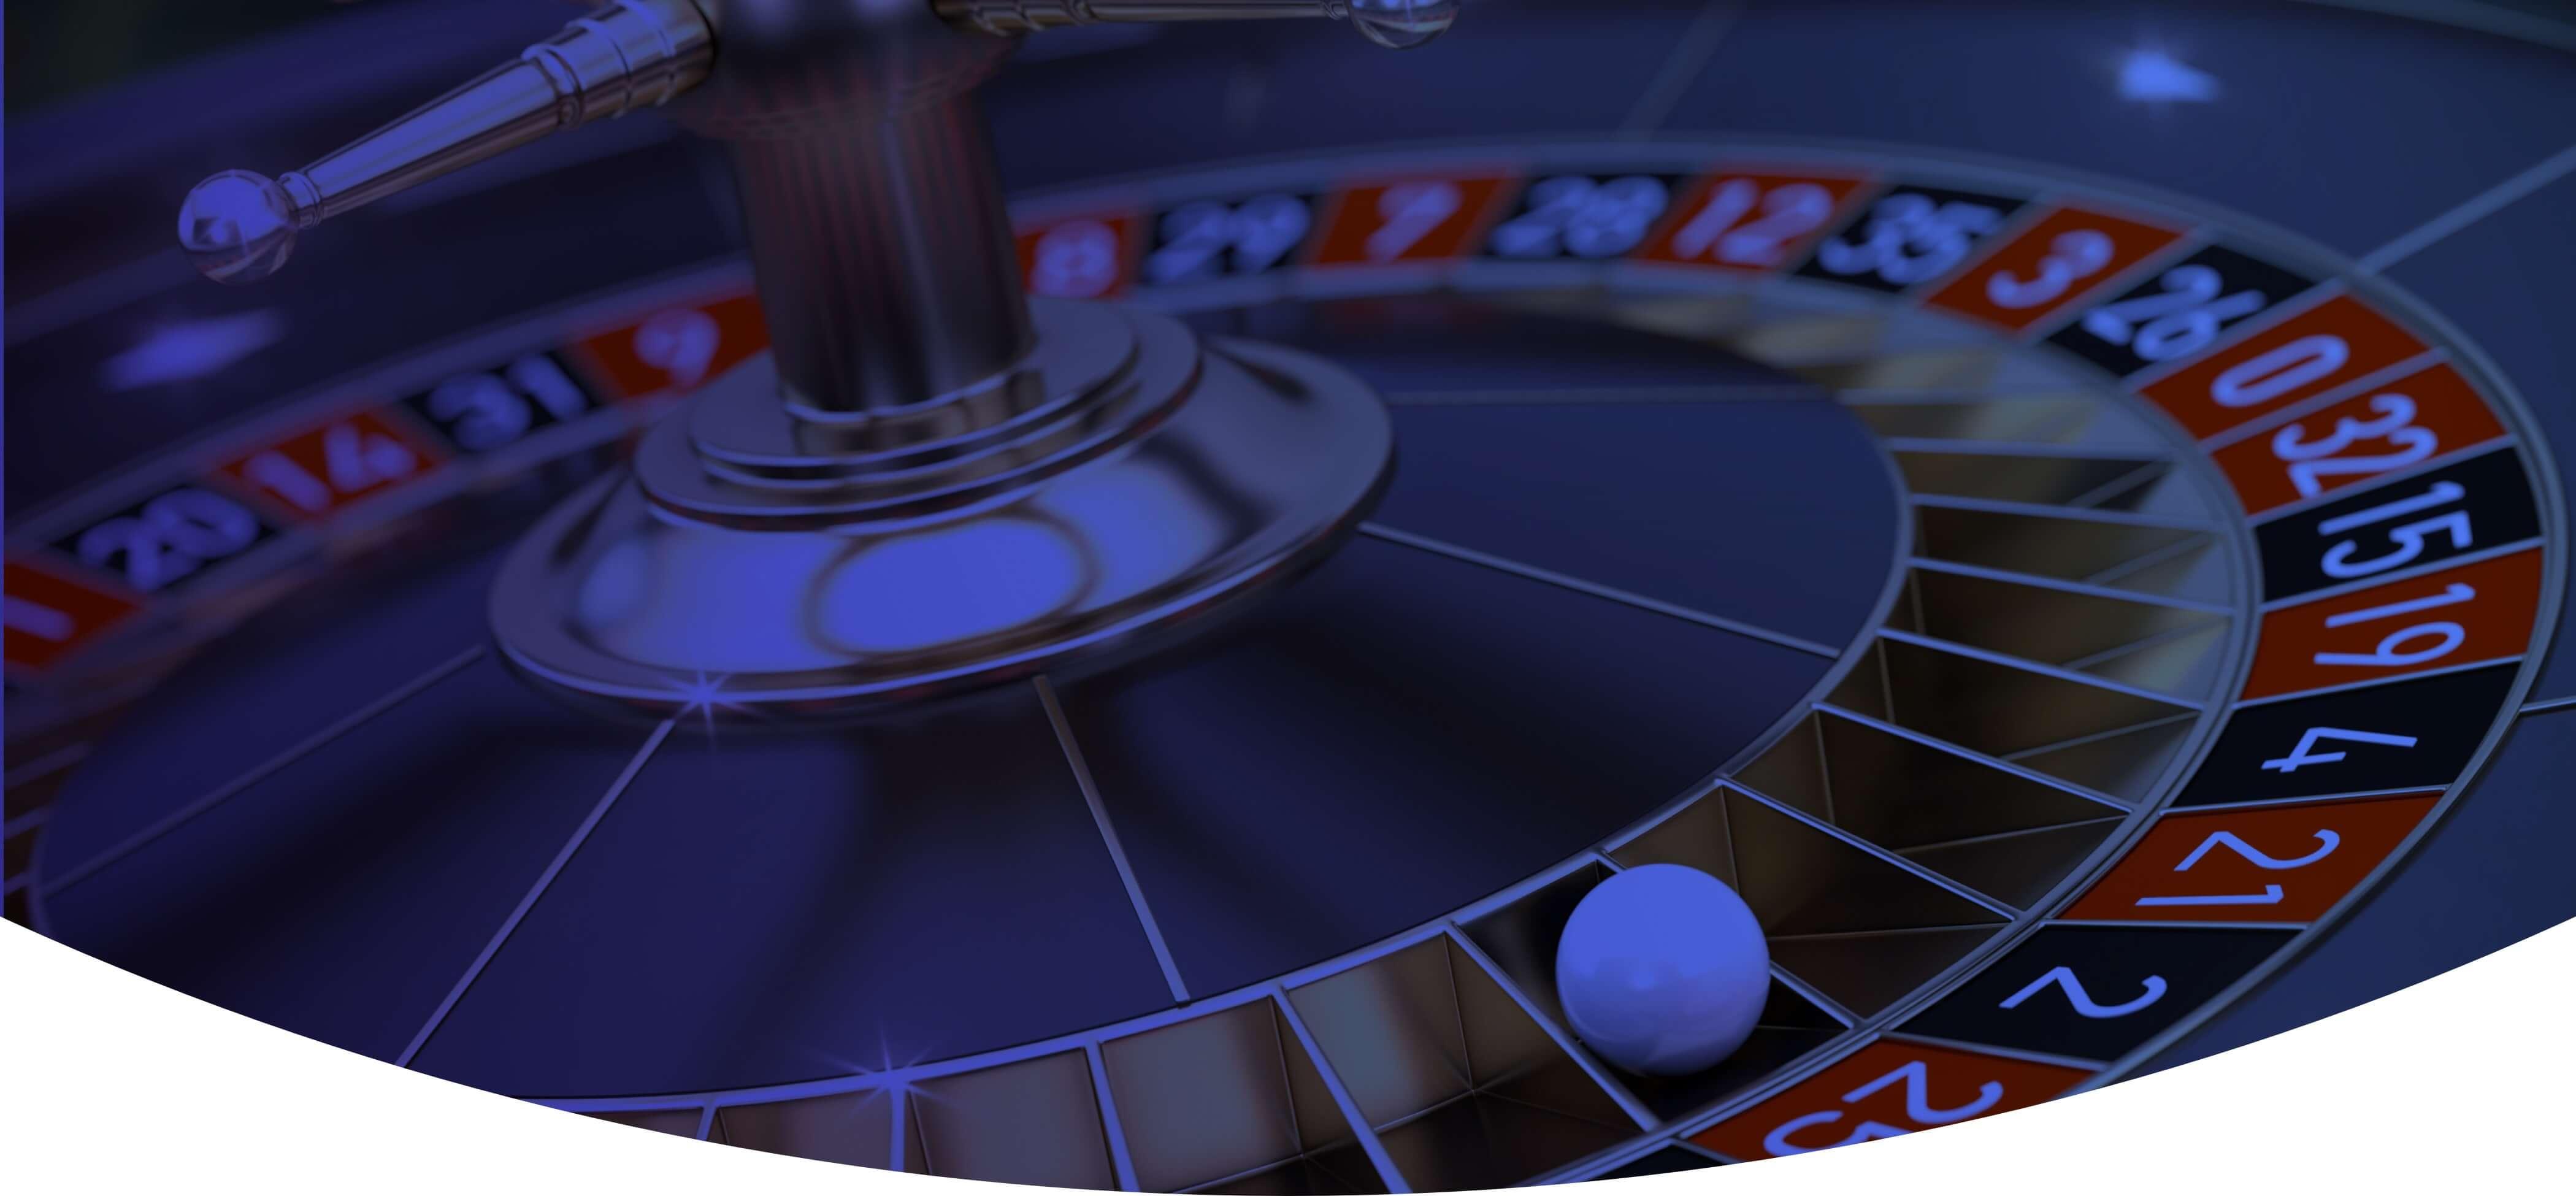 Ebay roulette wheel